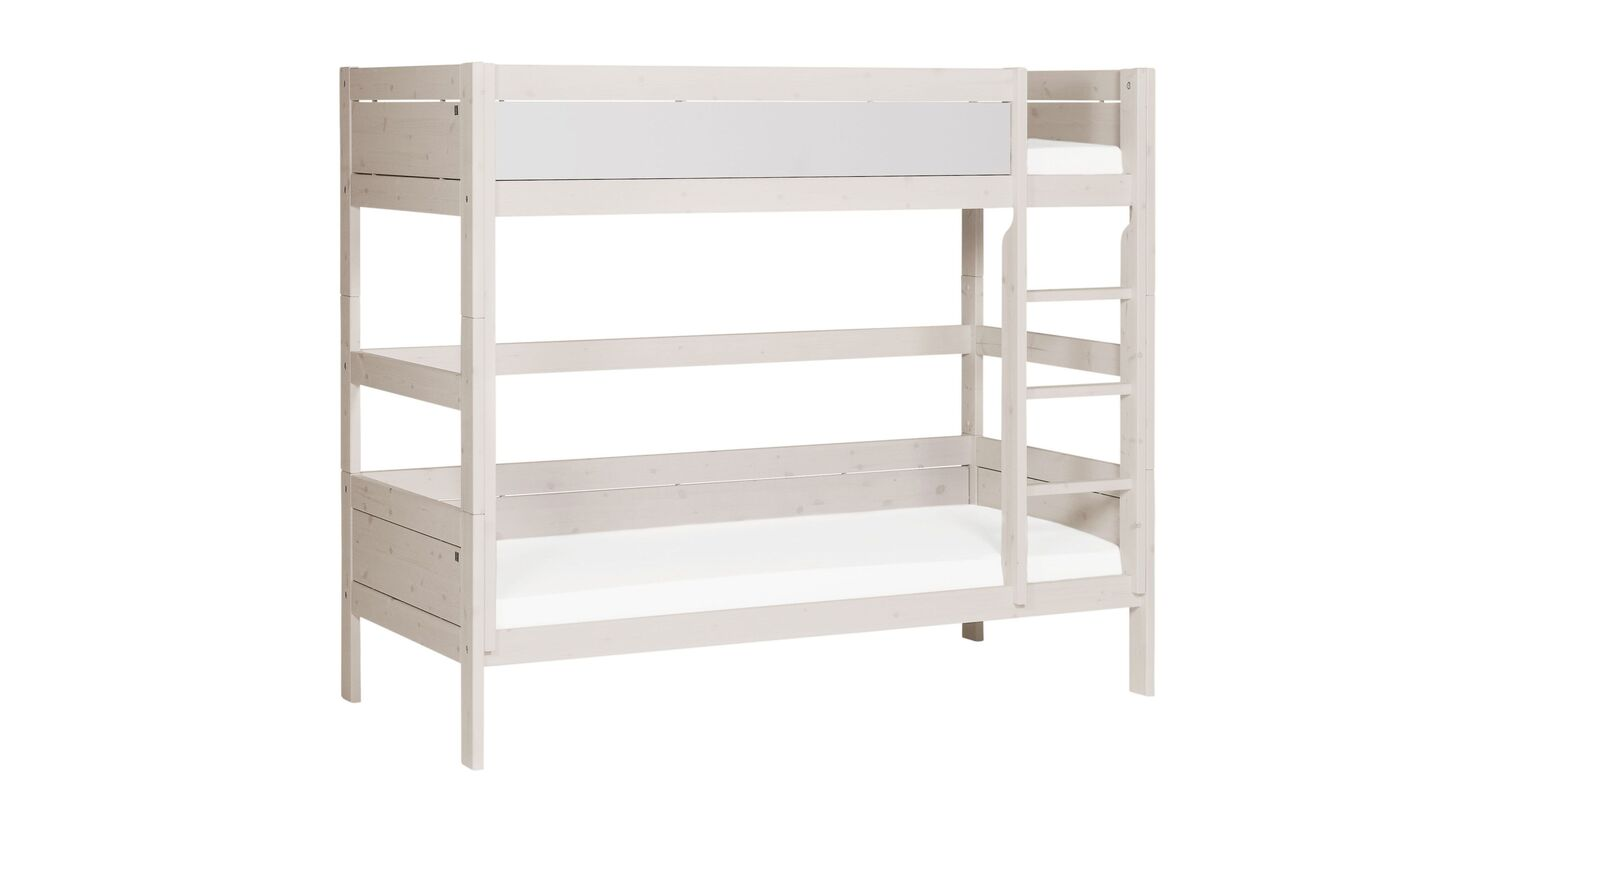 LIFETIME Etagenbett Color mit weiß lackierter Front